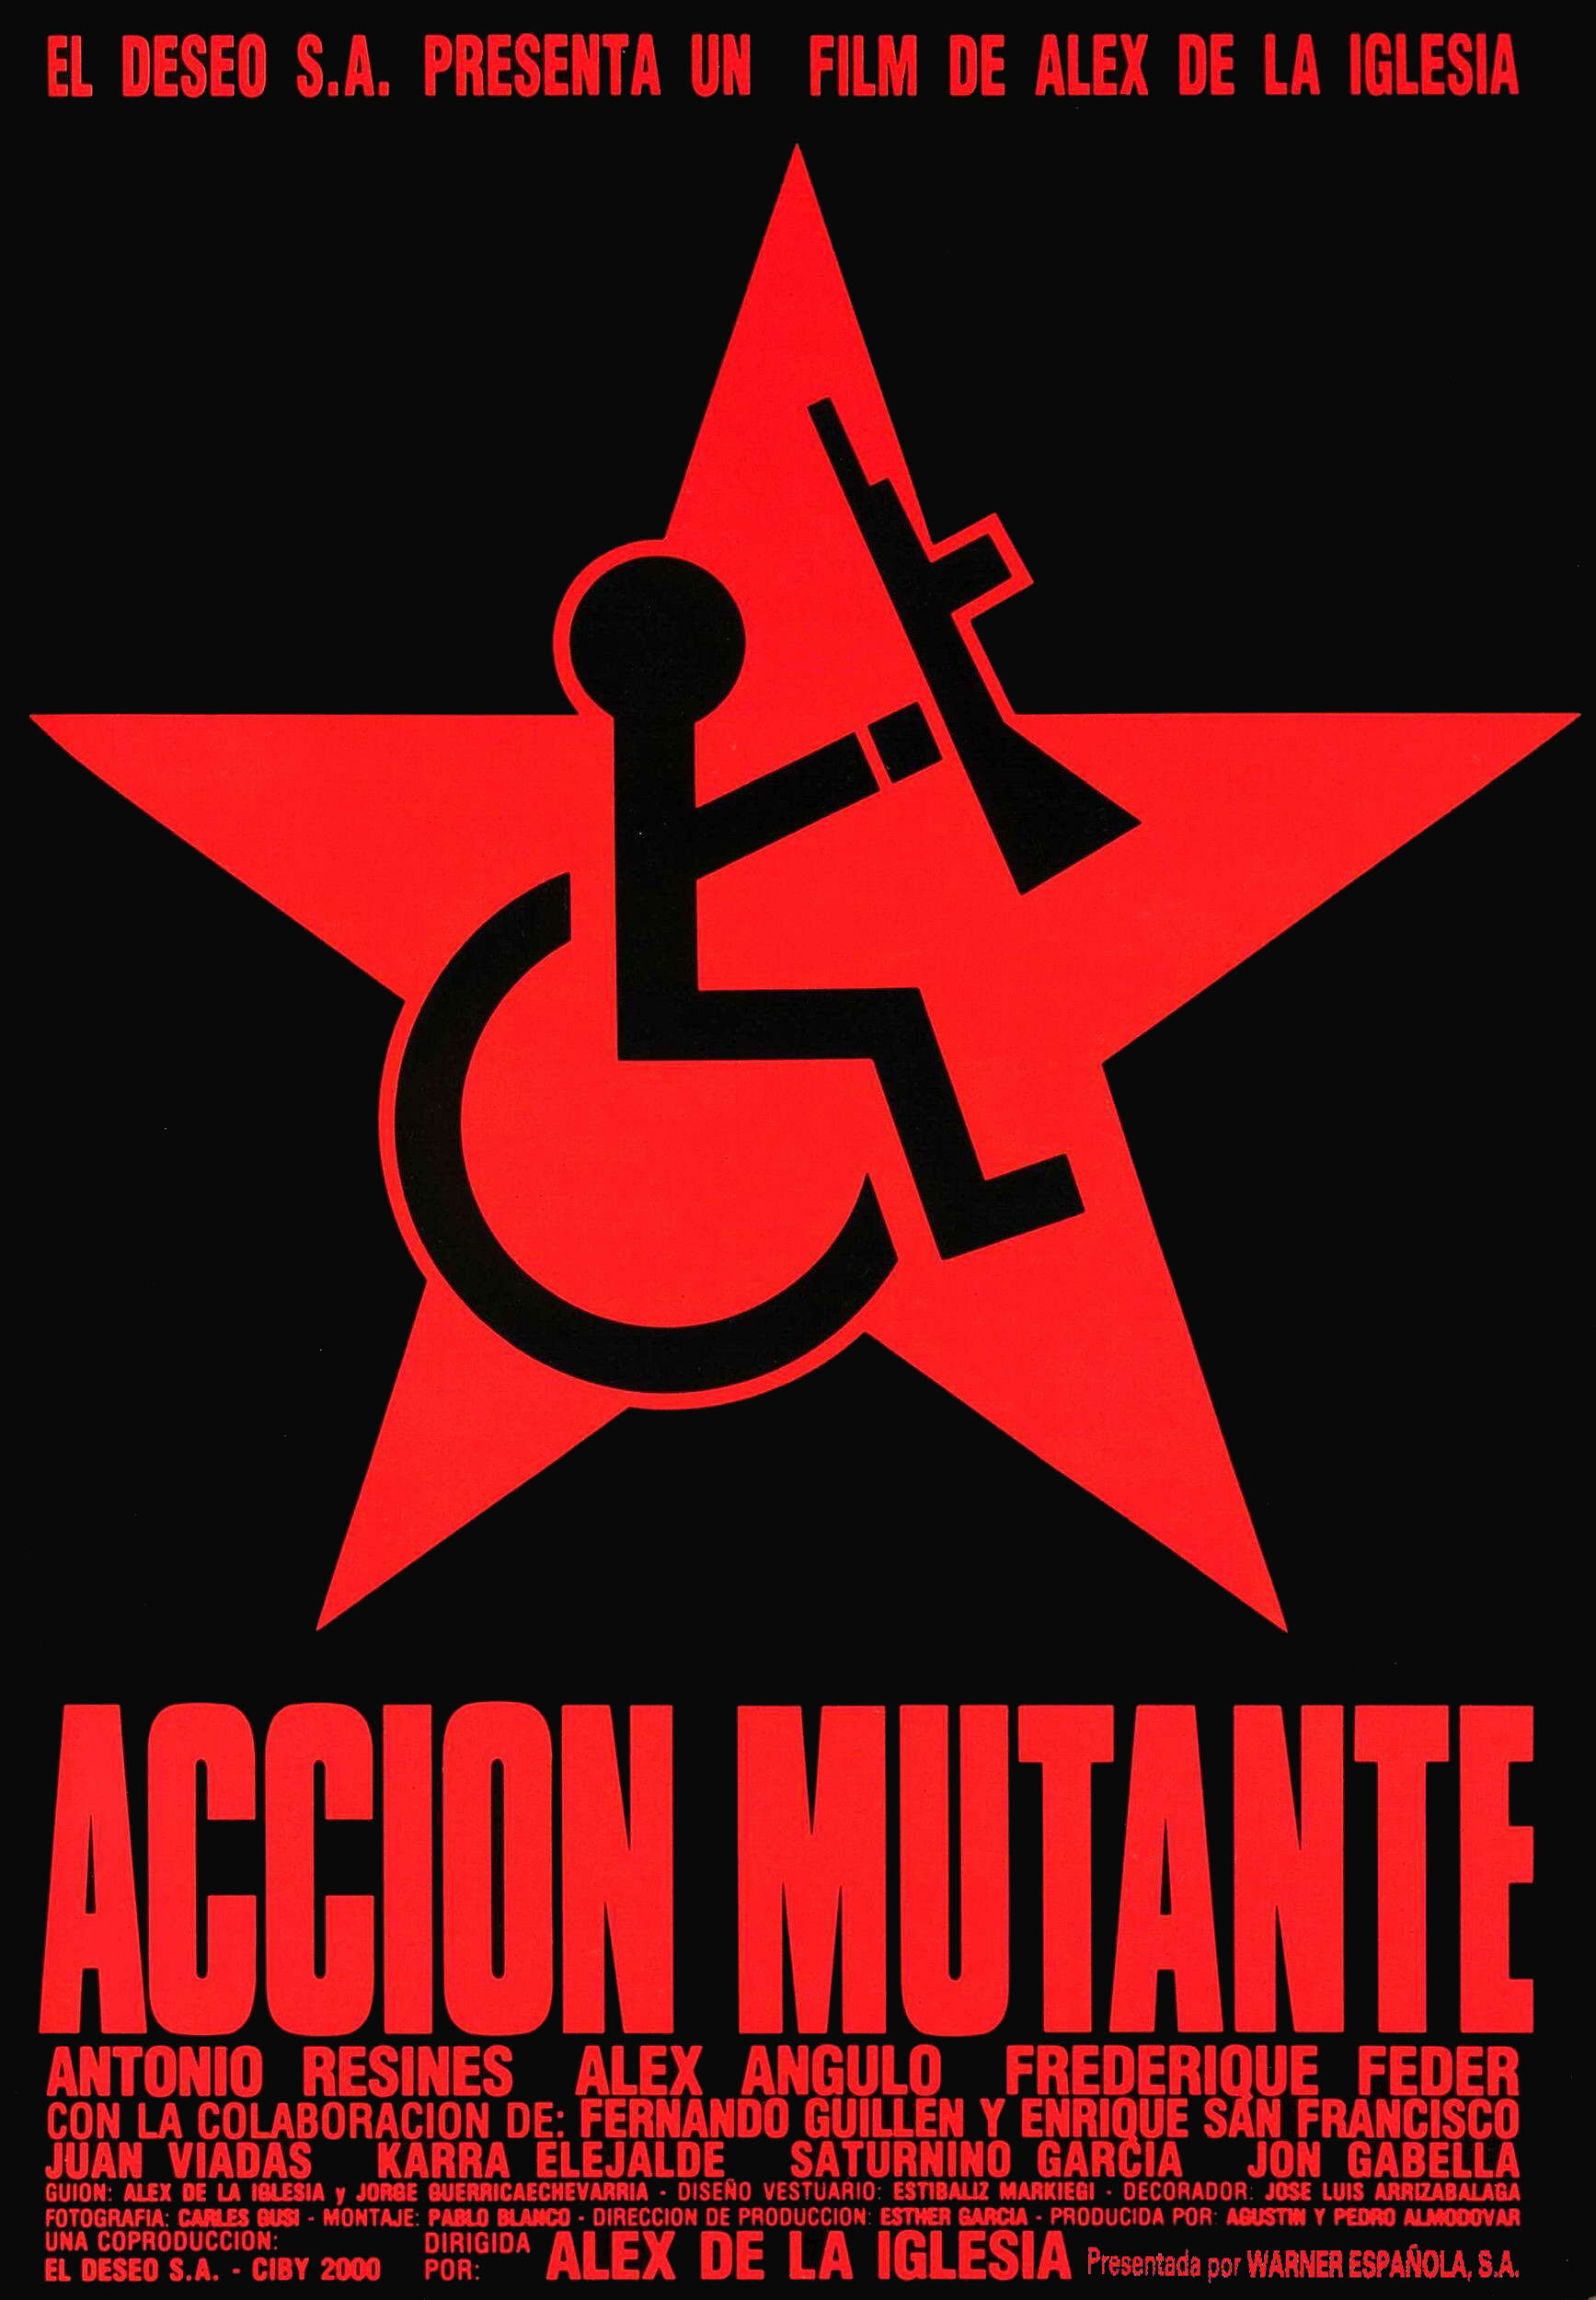 Action Mutante 2